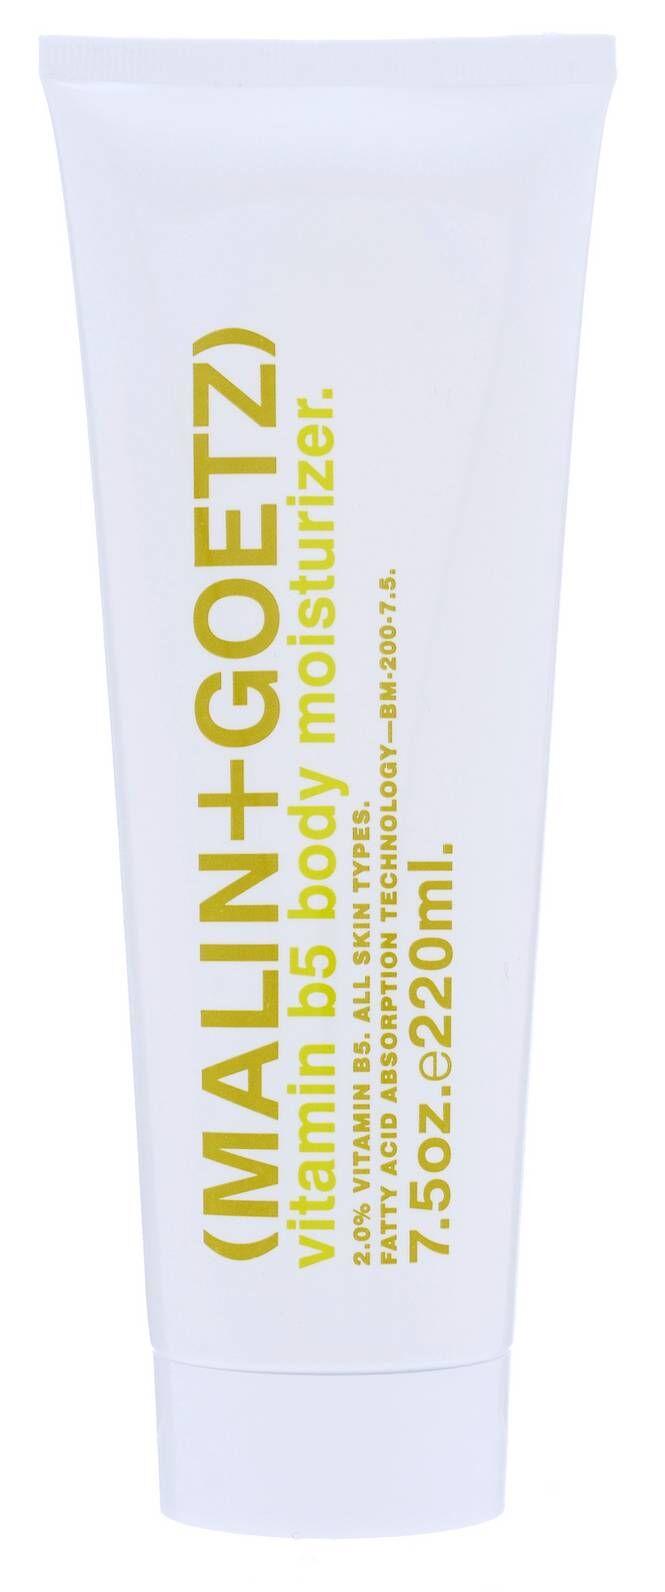 Malin + Goetz Vitamin B5 Body & Hand Lotion 250 ml